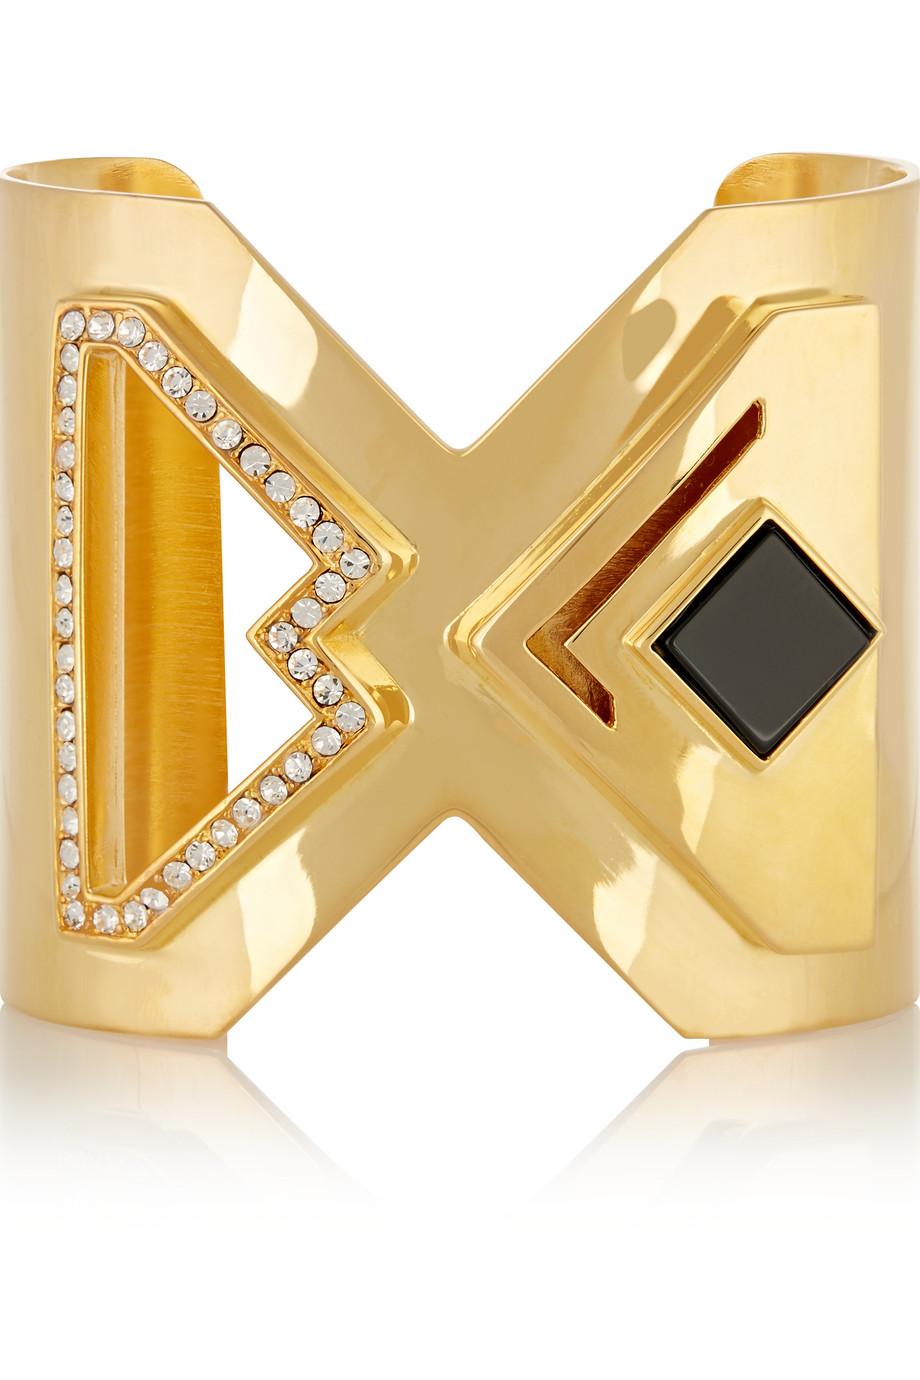 Kilian Lights & Reflections Gold-Plated, Swarovski Crystal and Onyx Cuff, Women's